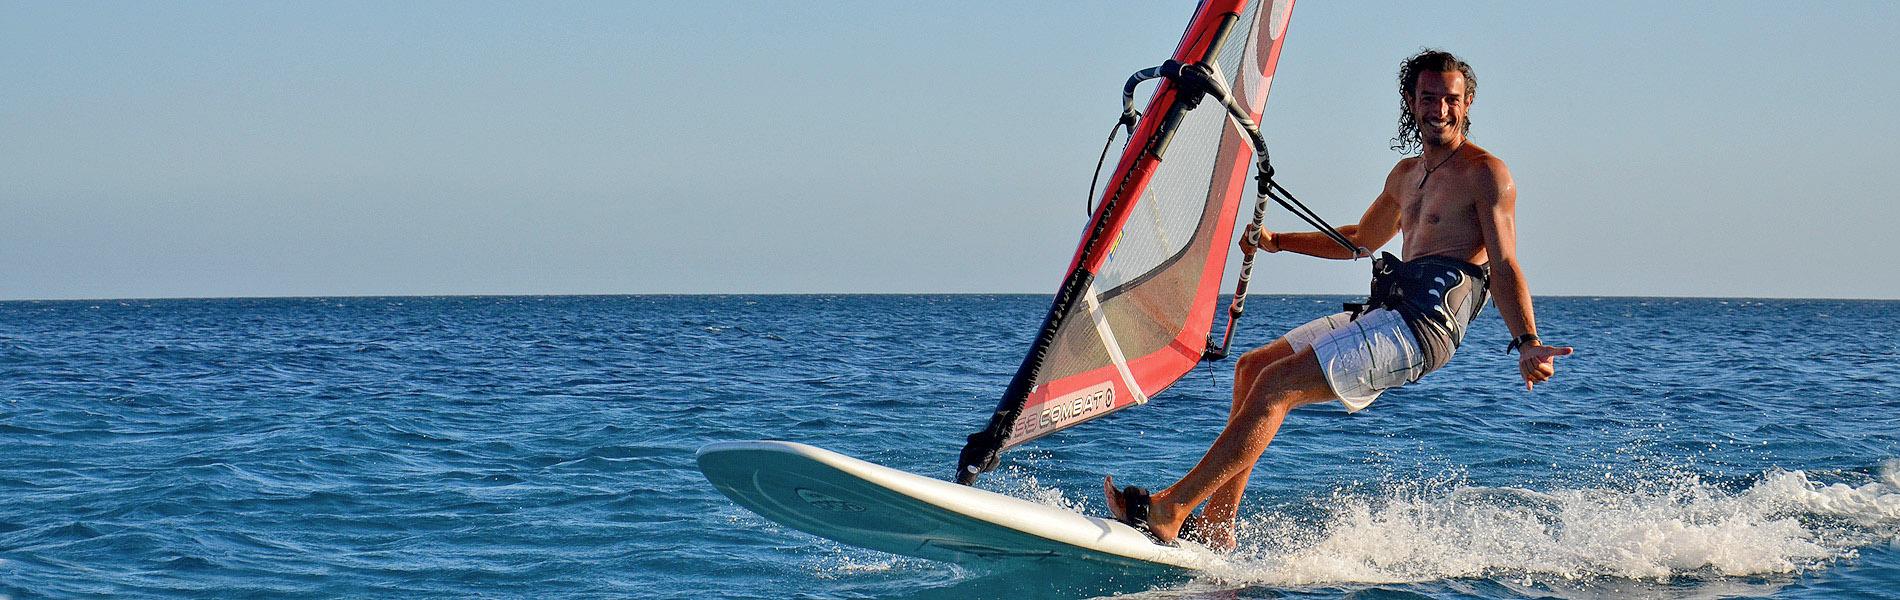 Windsurf Show Nauticlub